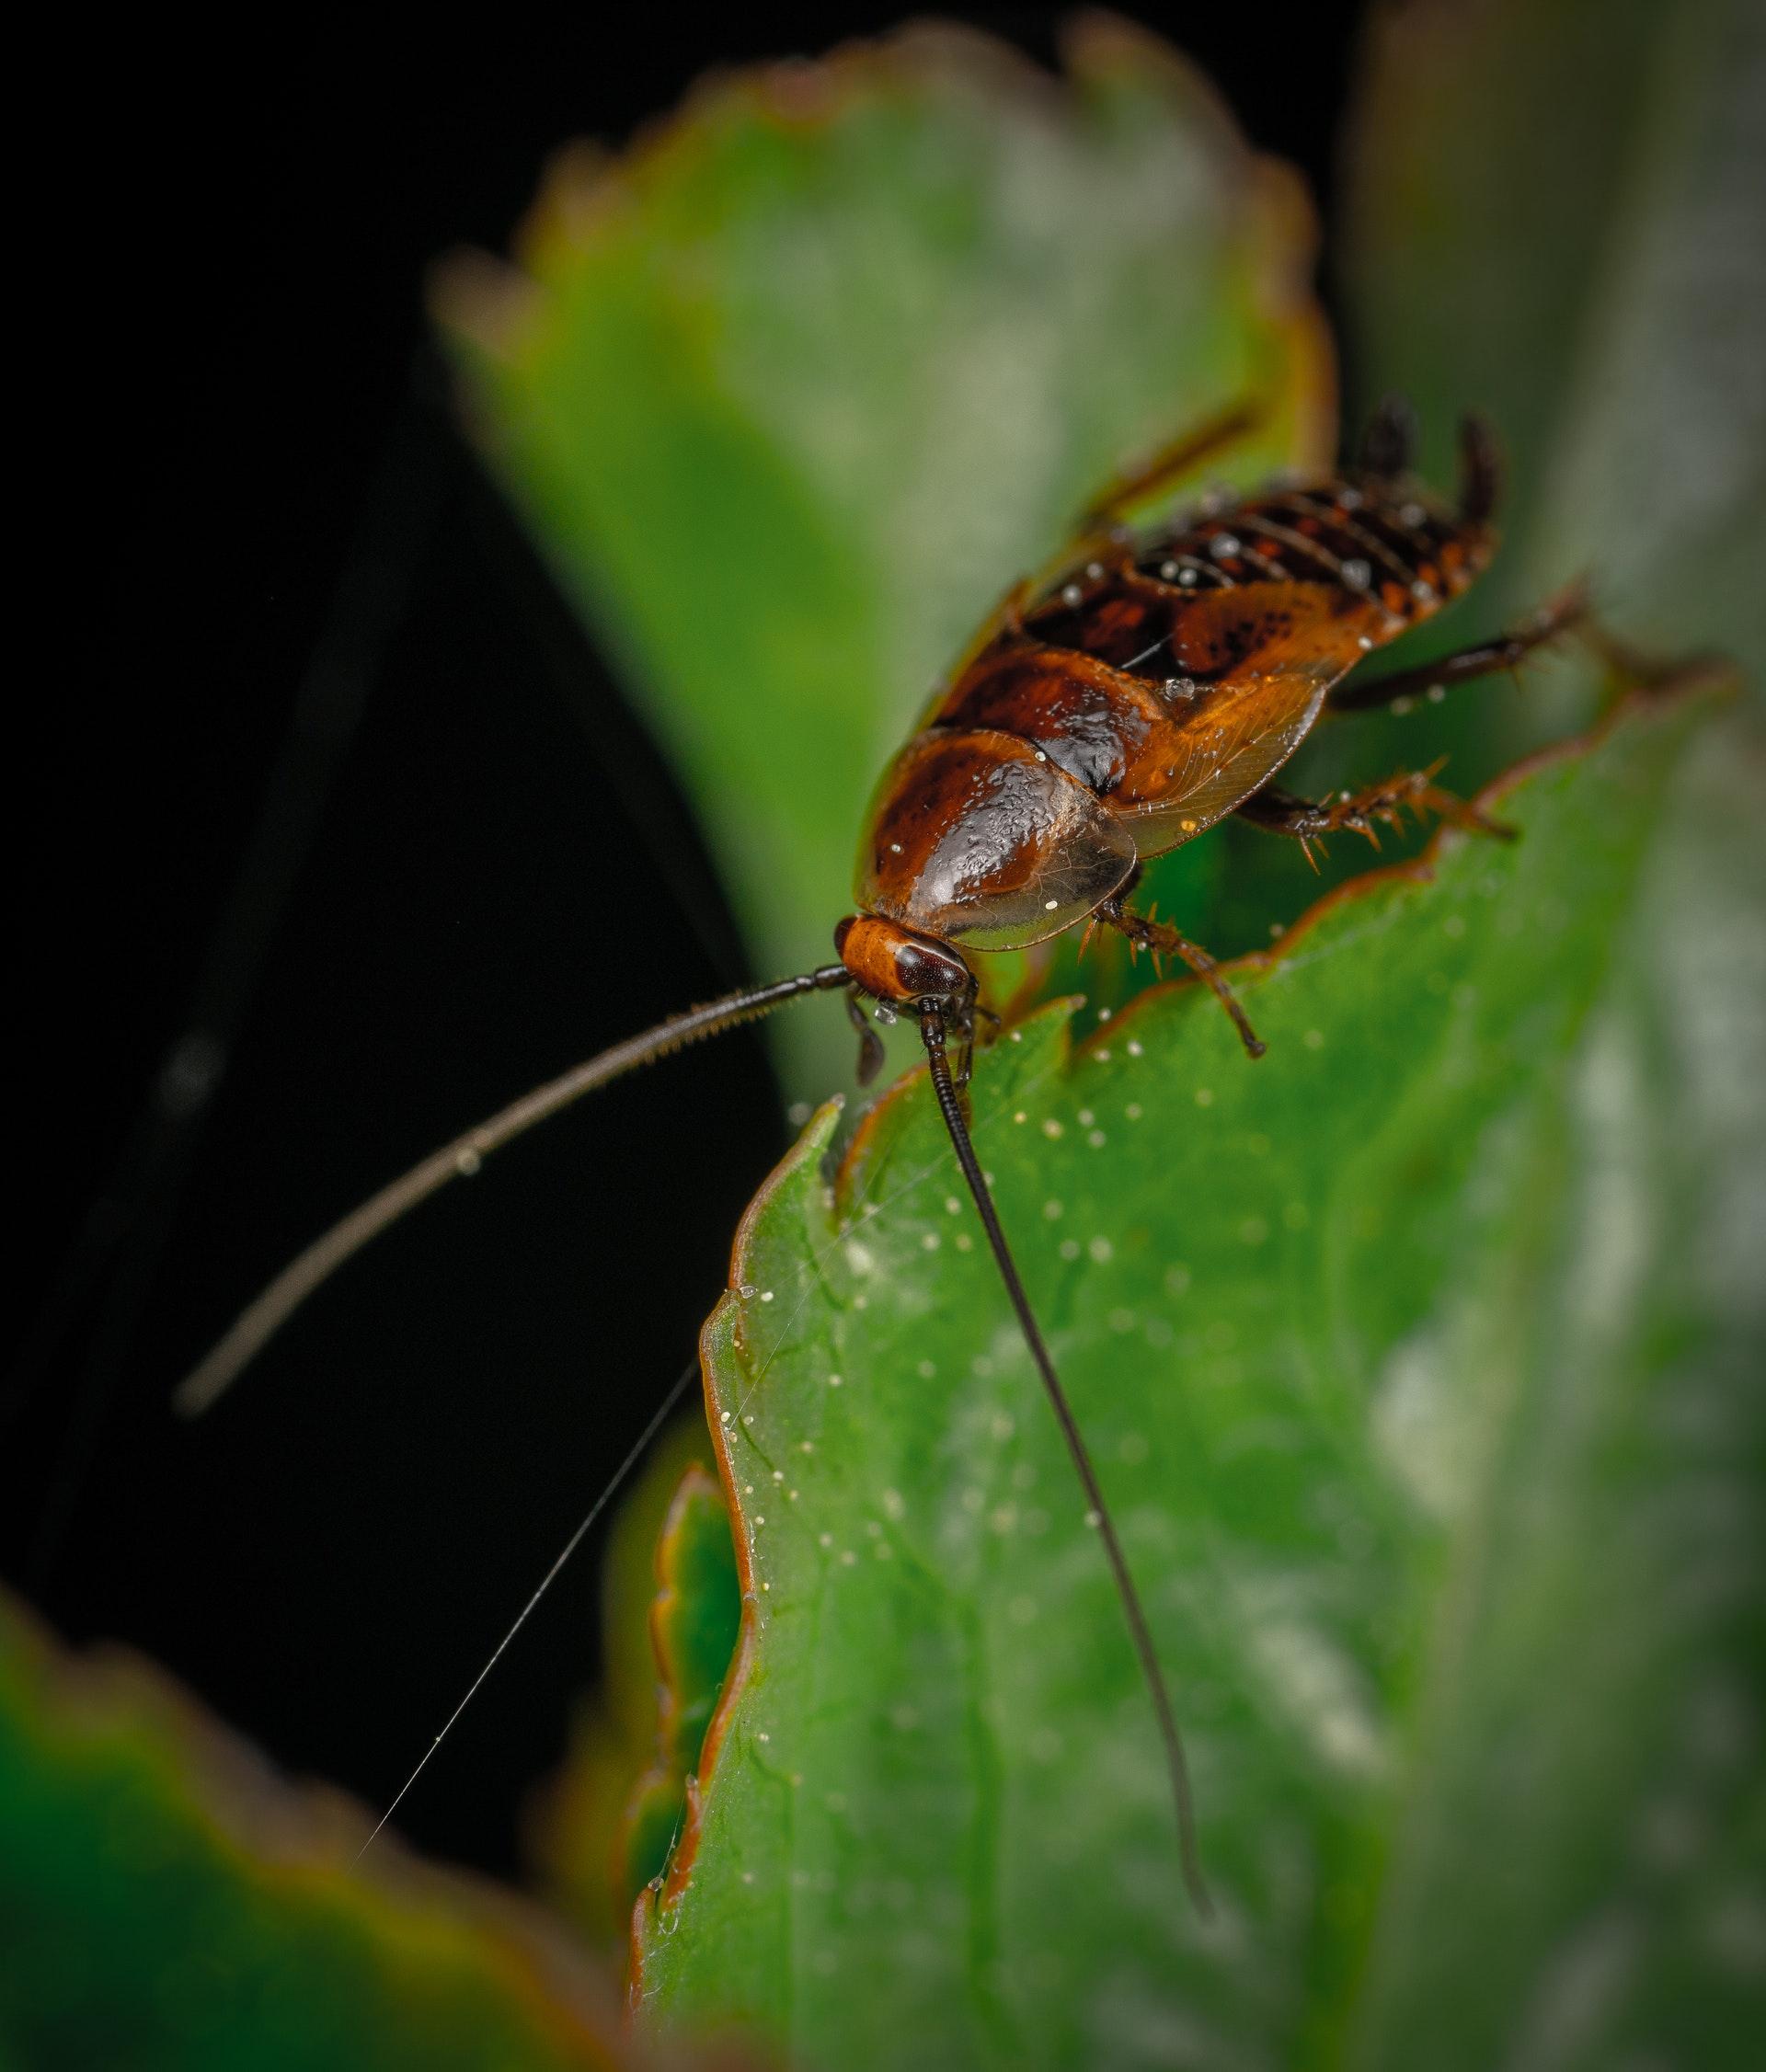 West Norwood Pest Control Services